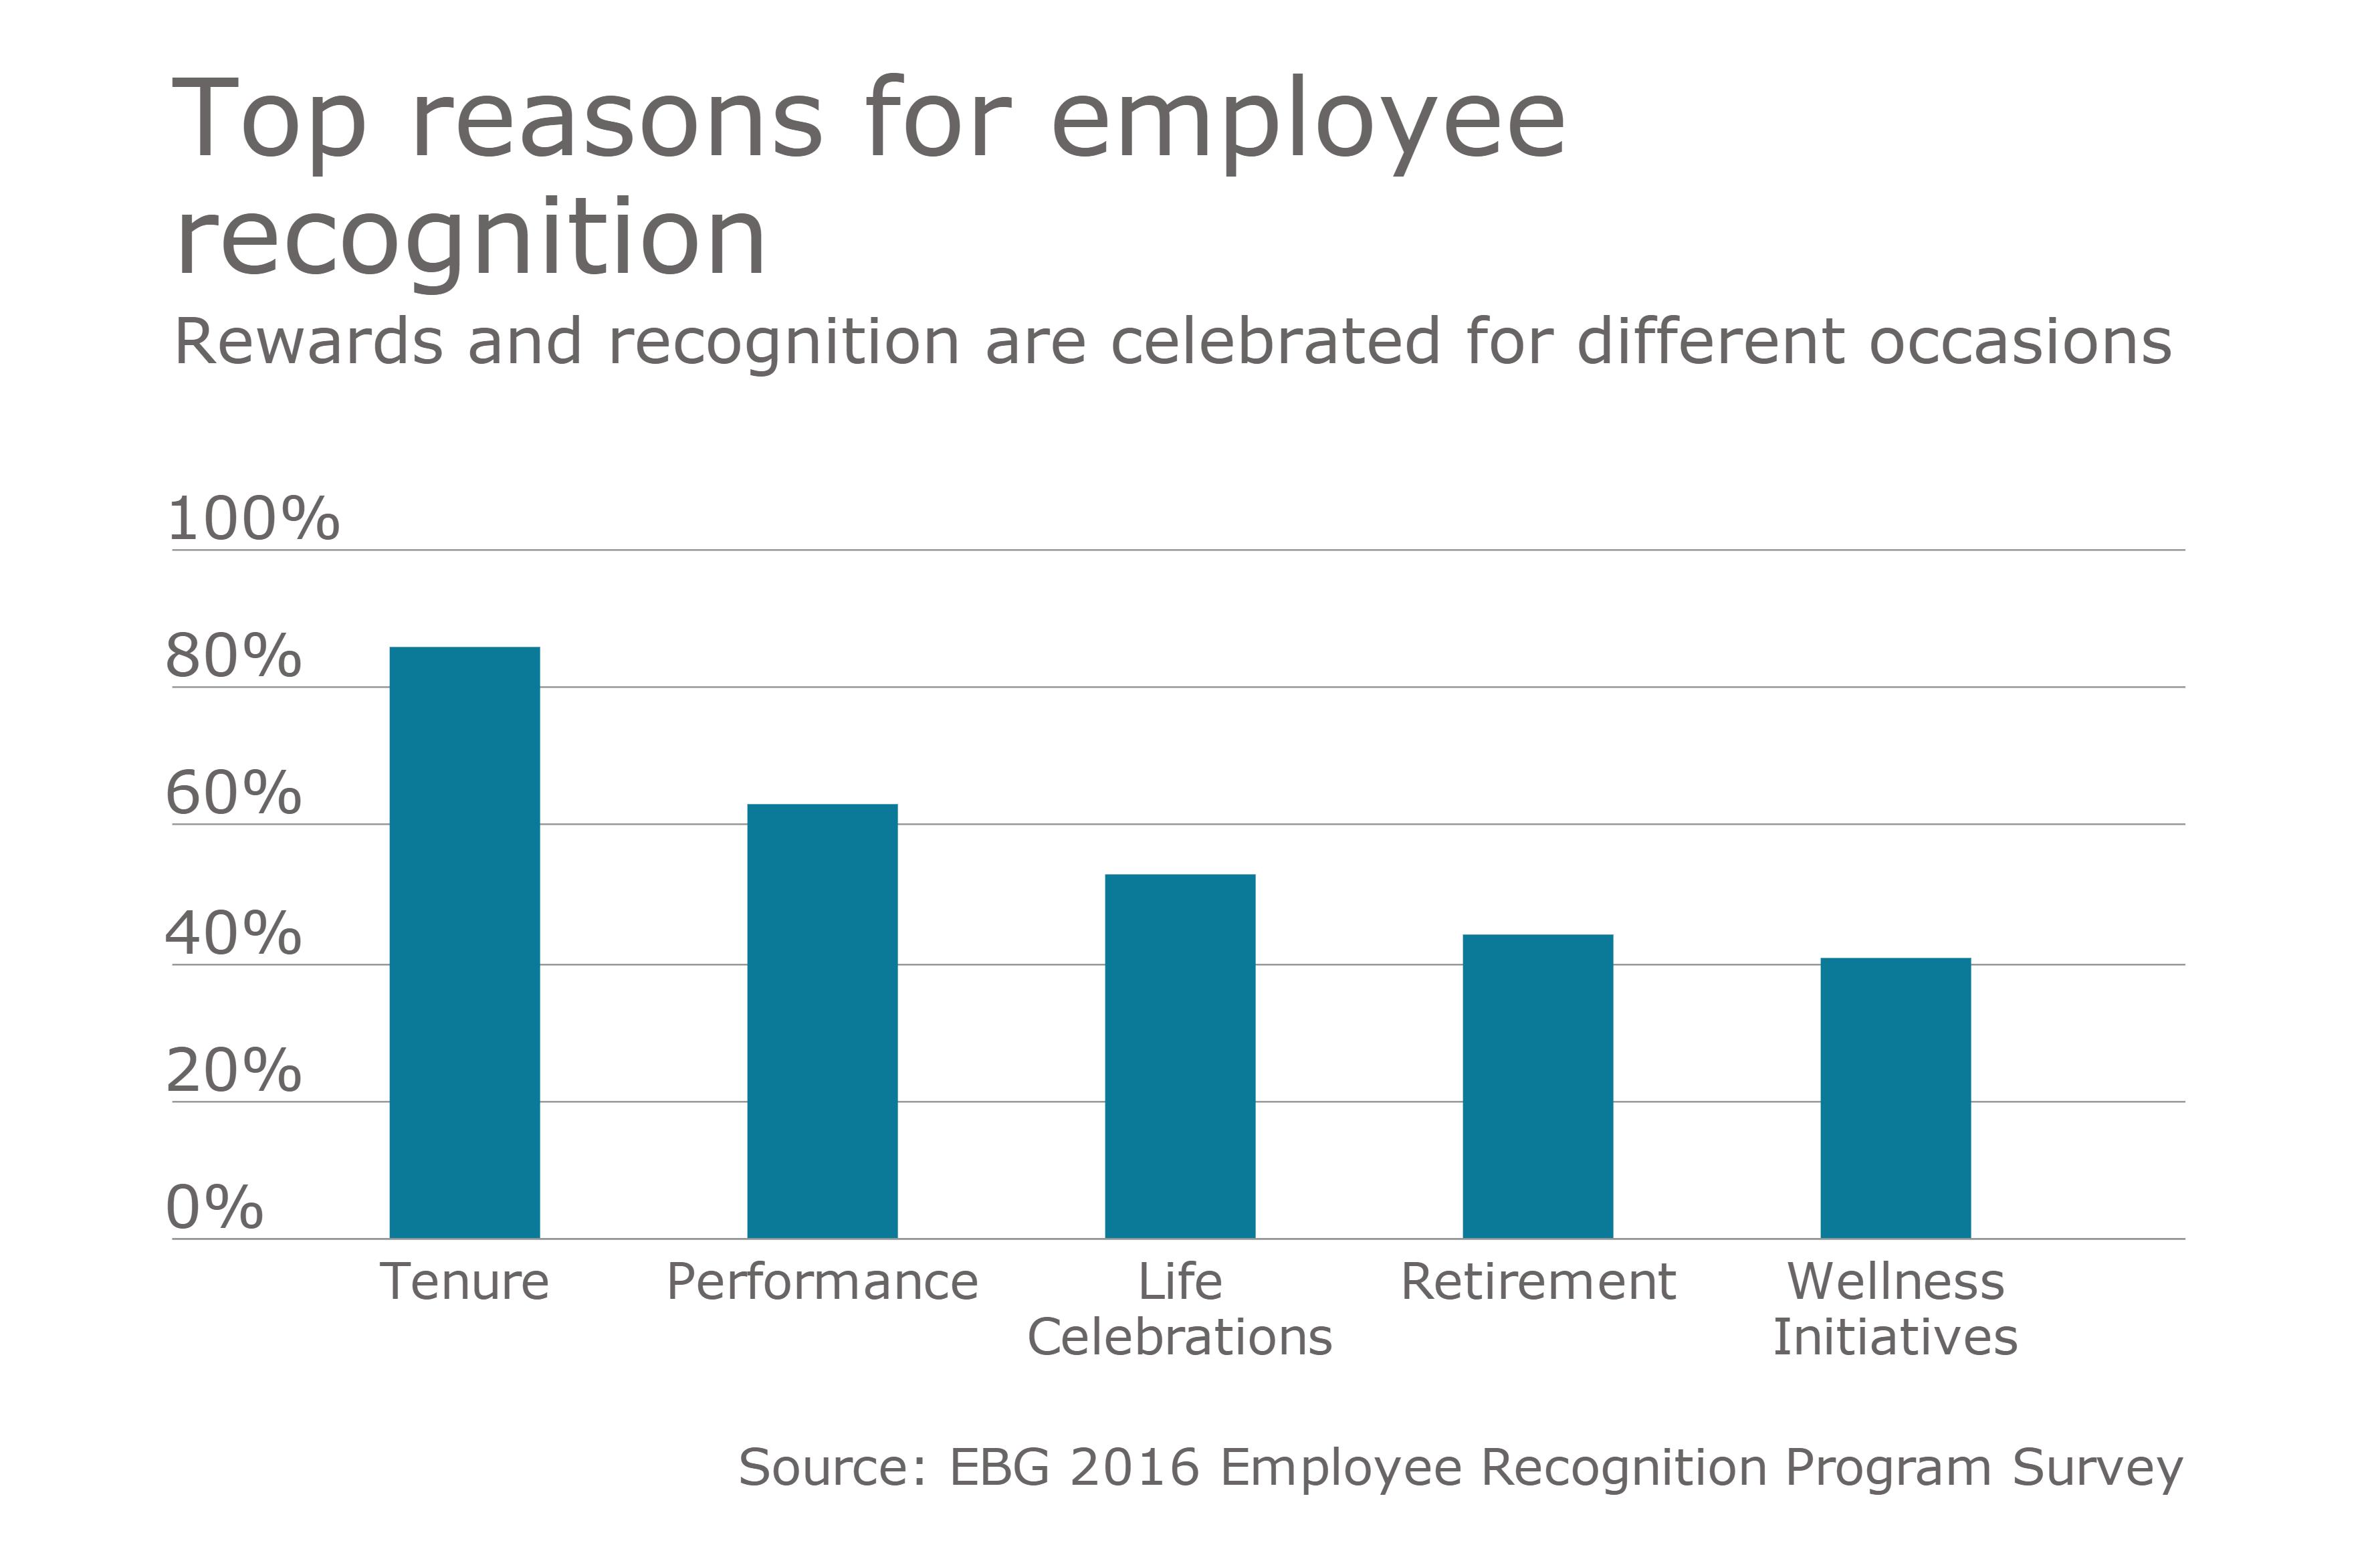 https://assets.sourcemedia.com/75/ca/f8f47cbf4f92a8b3bd1c08b5942f/employee-recgonition-chart.png